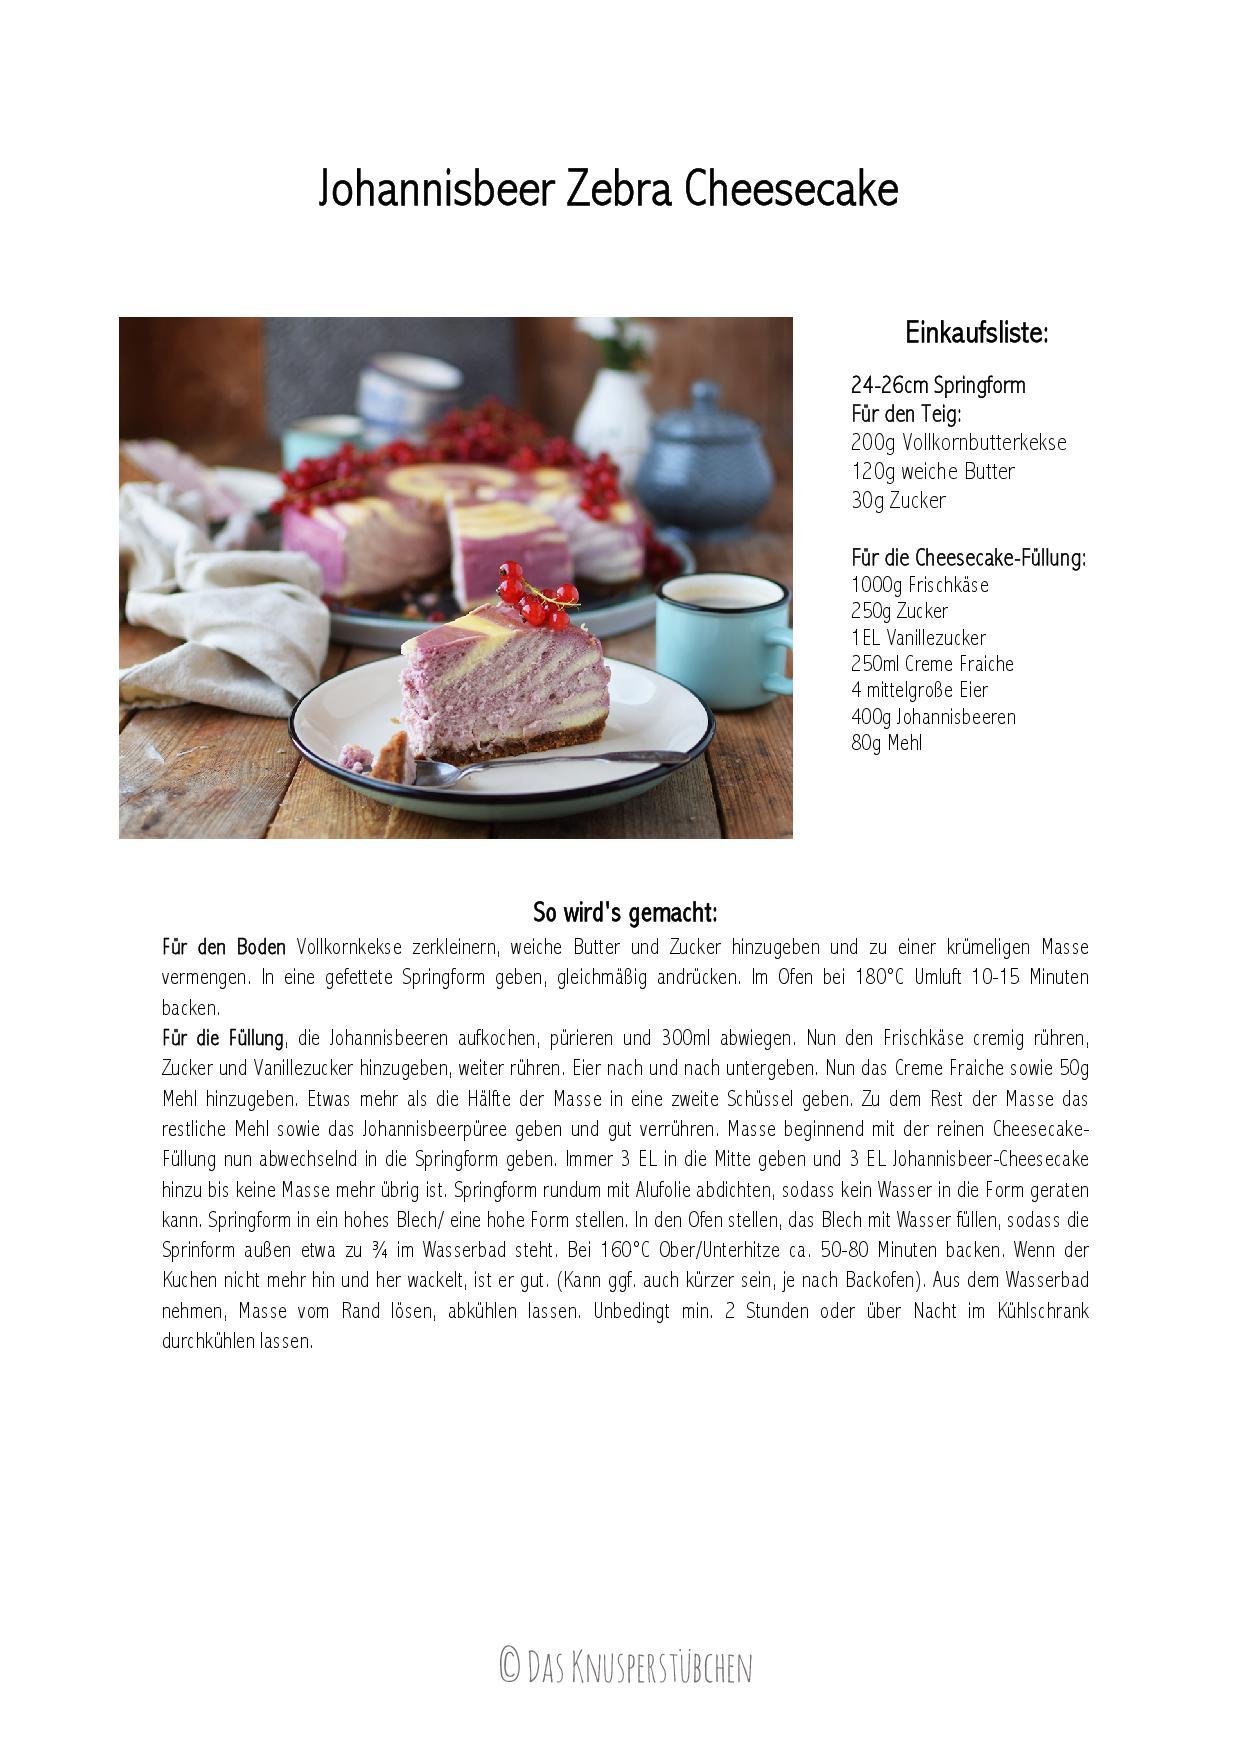 Johannisbeer Zebra Cheesecake-001